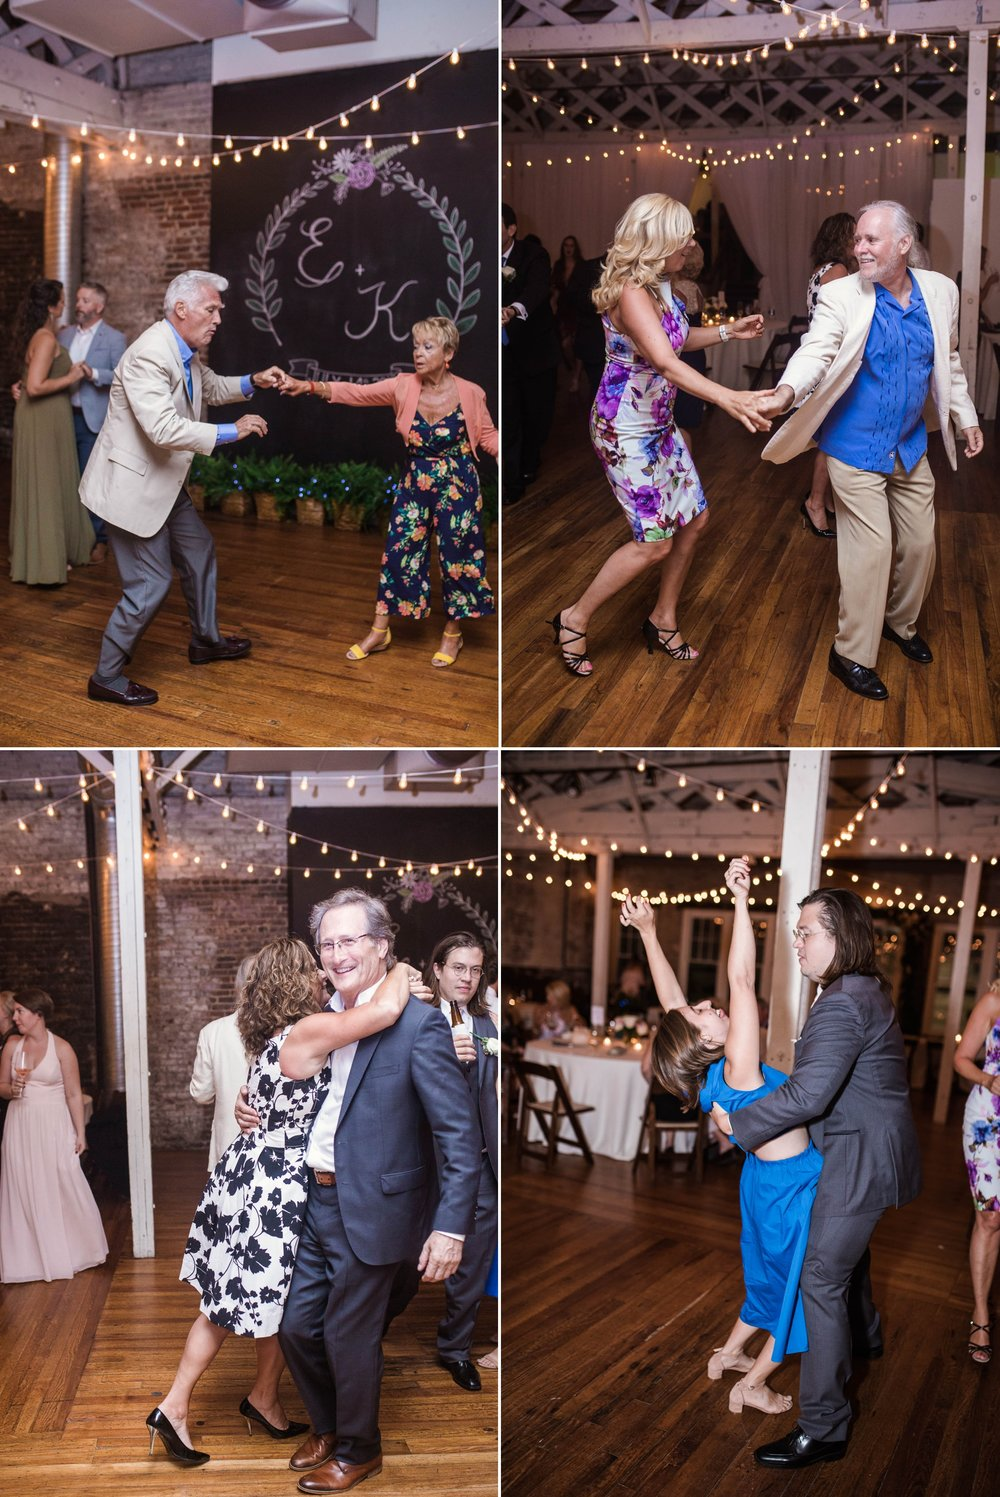 Elizabeth + Kane - Wedding at the Stockroom at 230 - Raleigh North Carolina Wedding Photographer 7.jpg